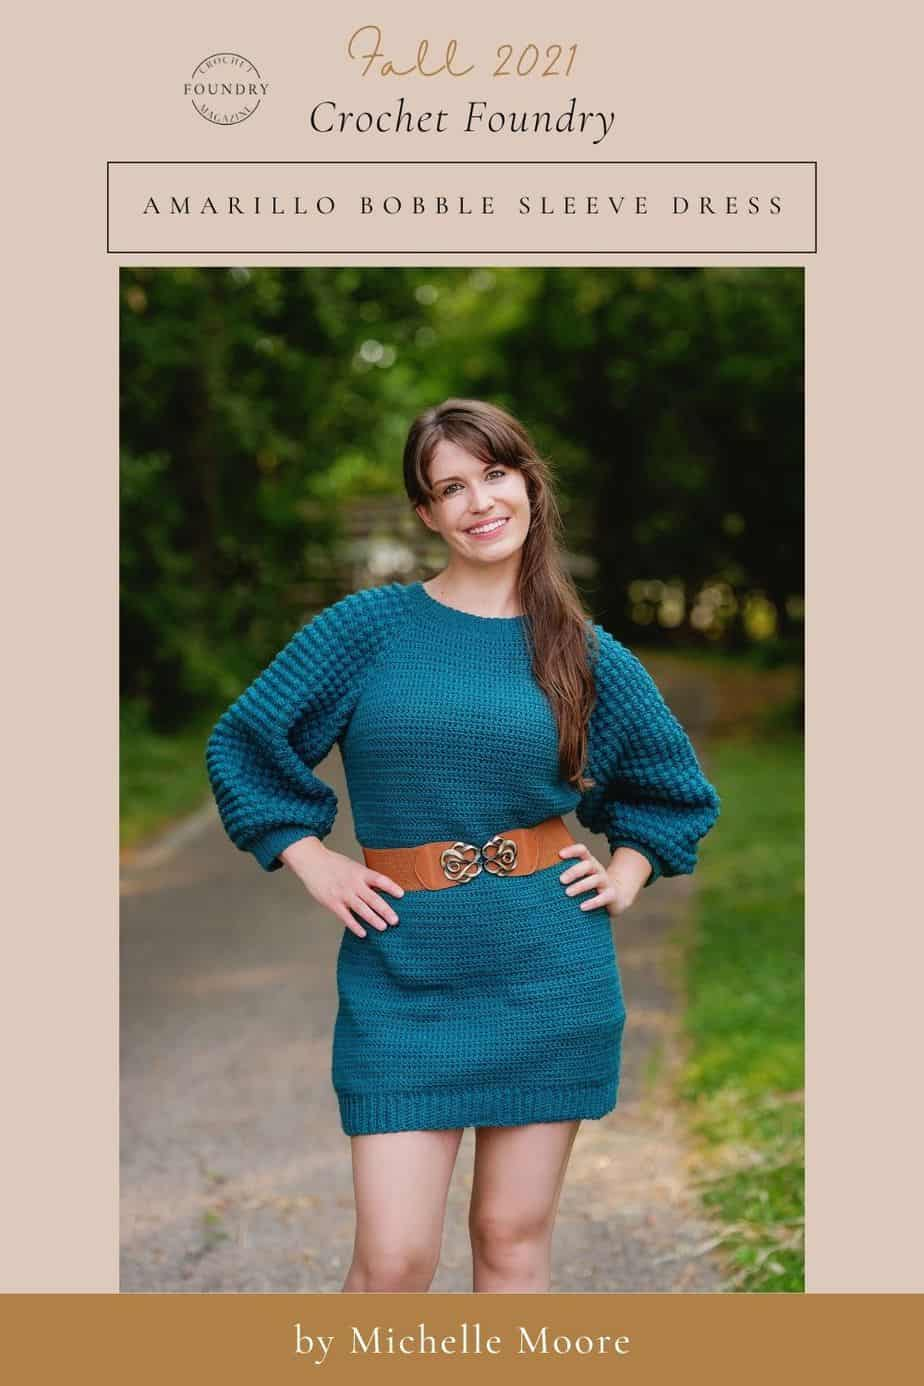 Amarillo Bobble Sleeve Dress crochet pattern by Michelle Moore for Crochet Foundry magazine Fall 2021